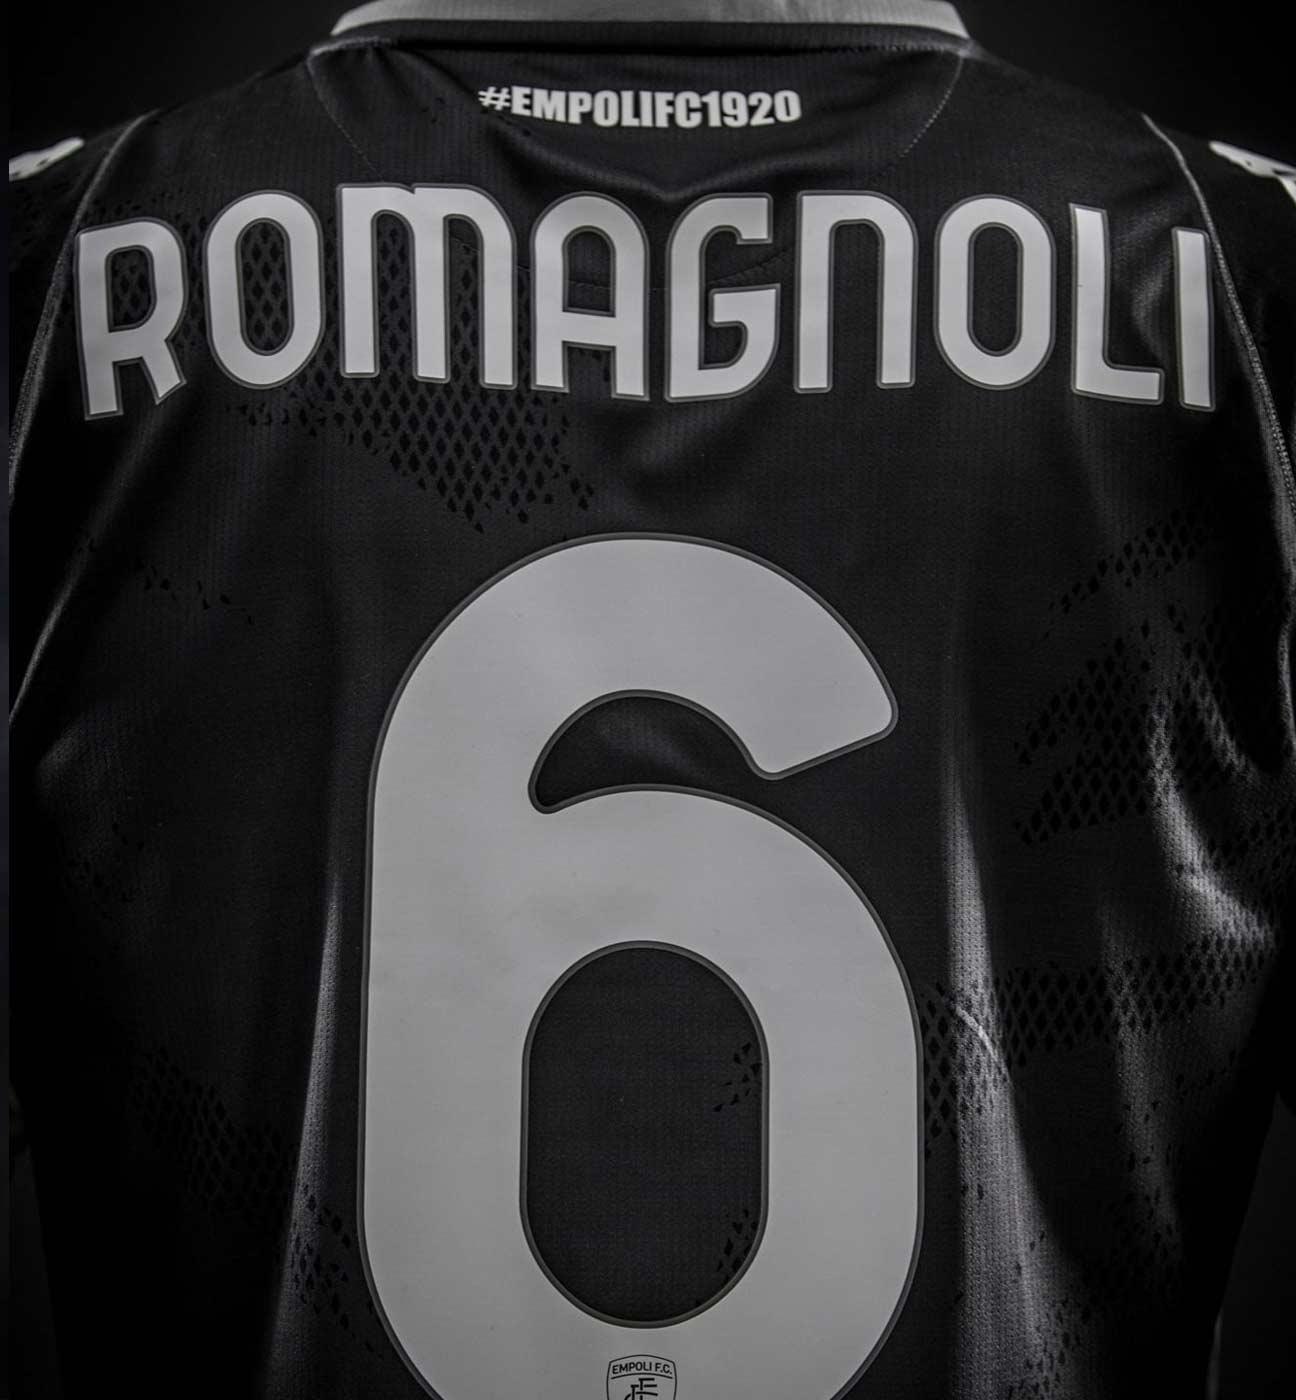 Romagnoli font Empoli